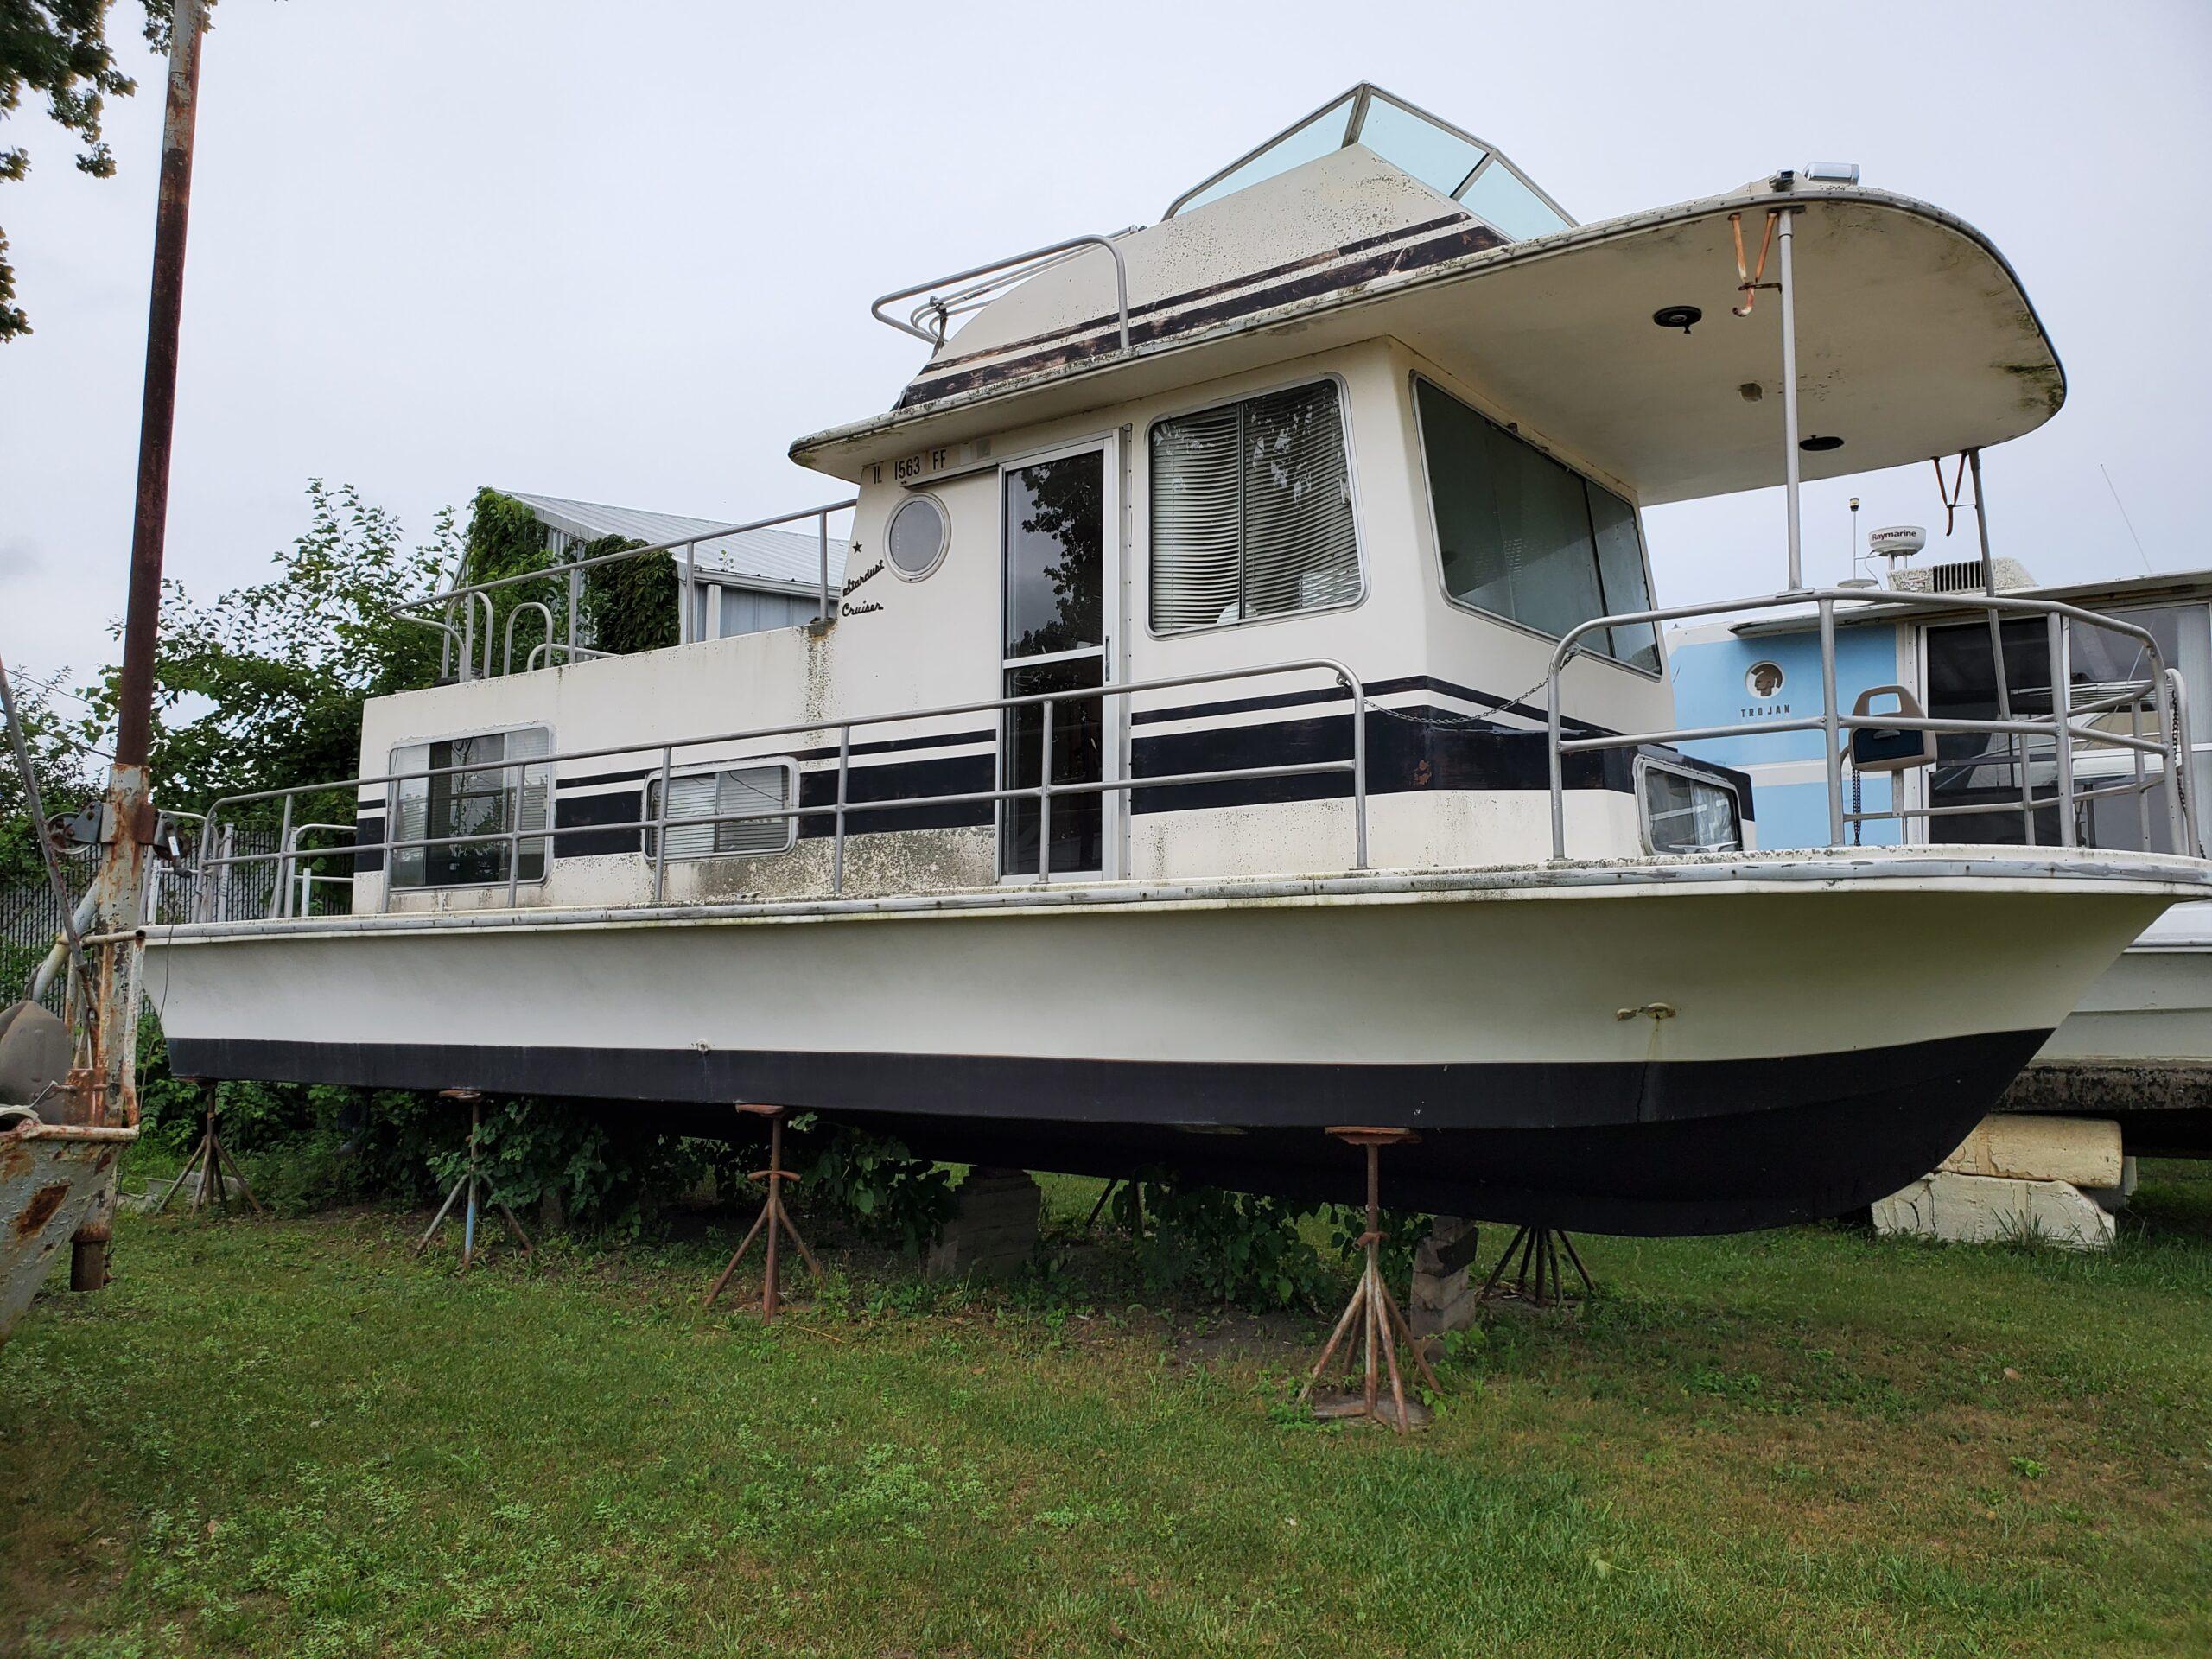 1979 Stardust Cruiser Silver Queen Houseboat